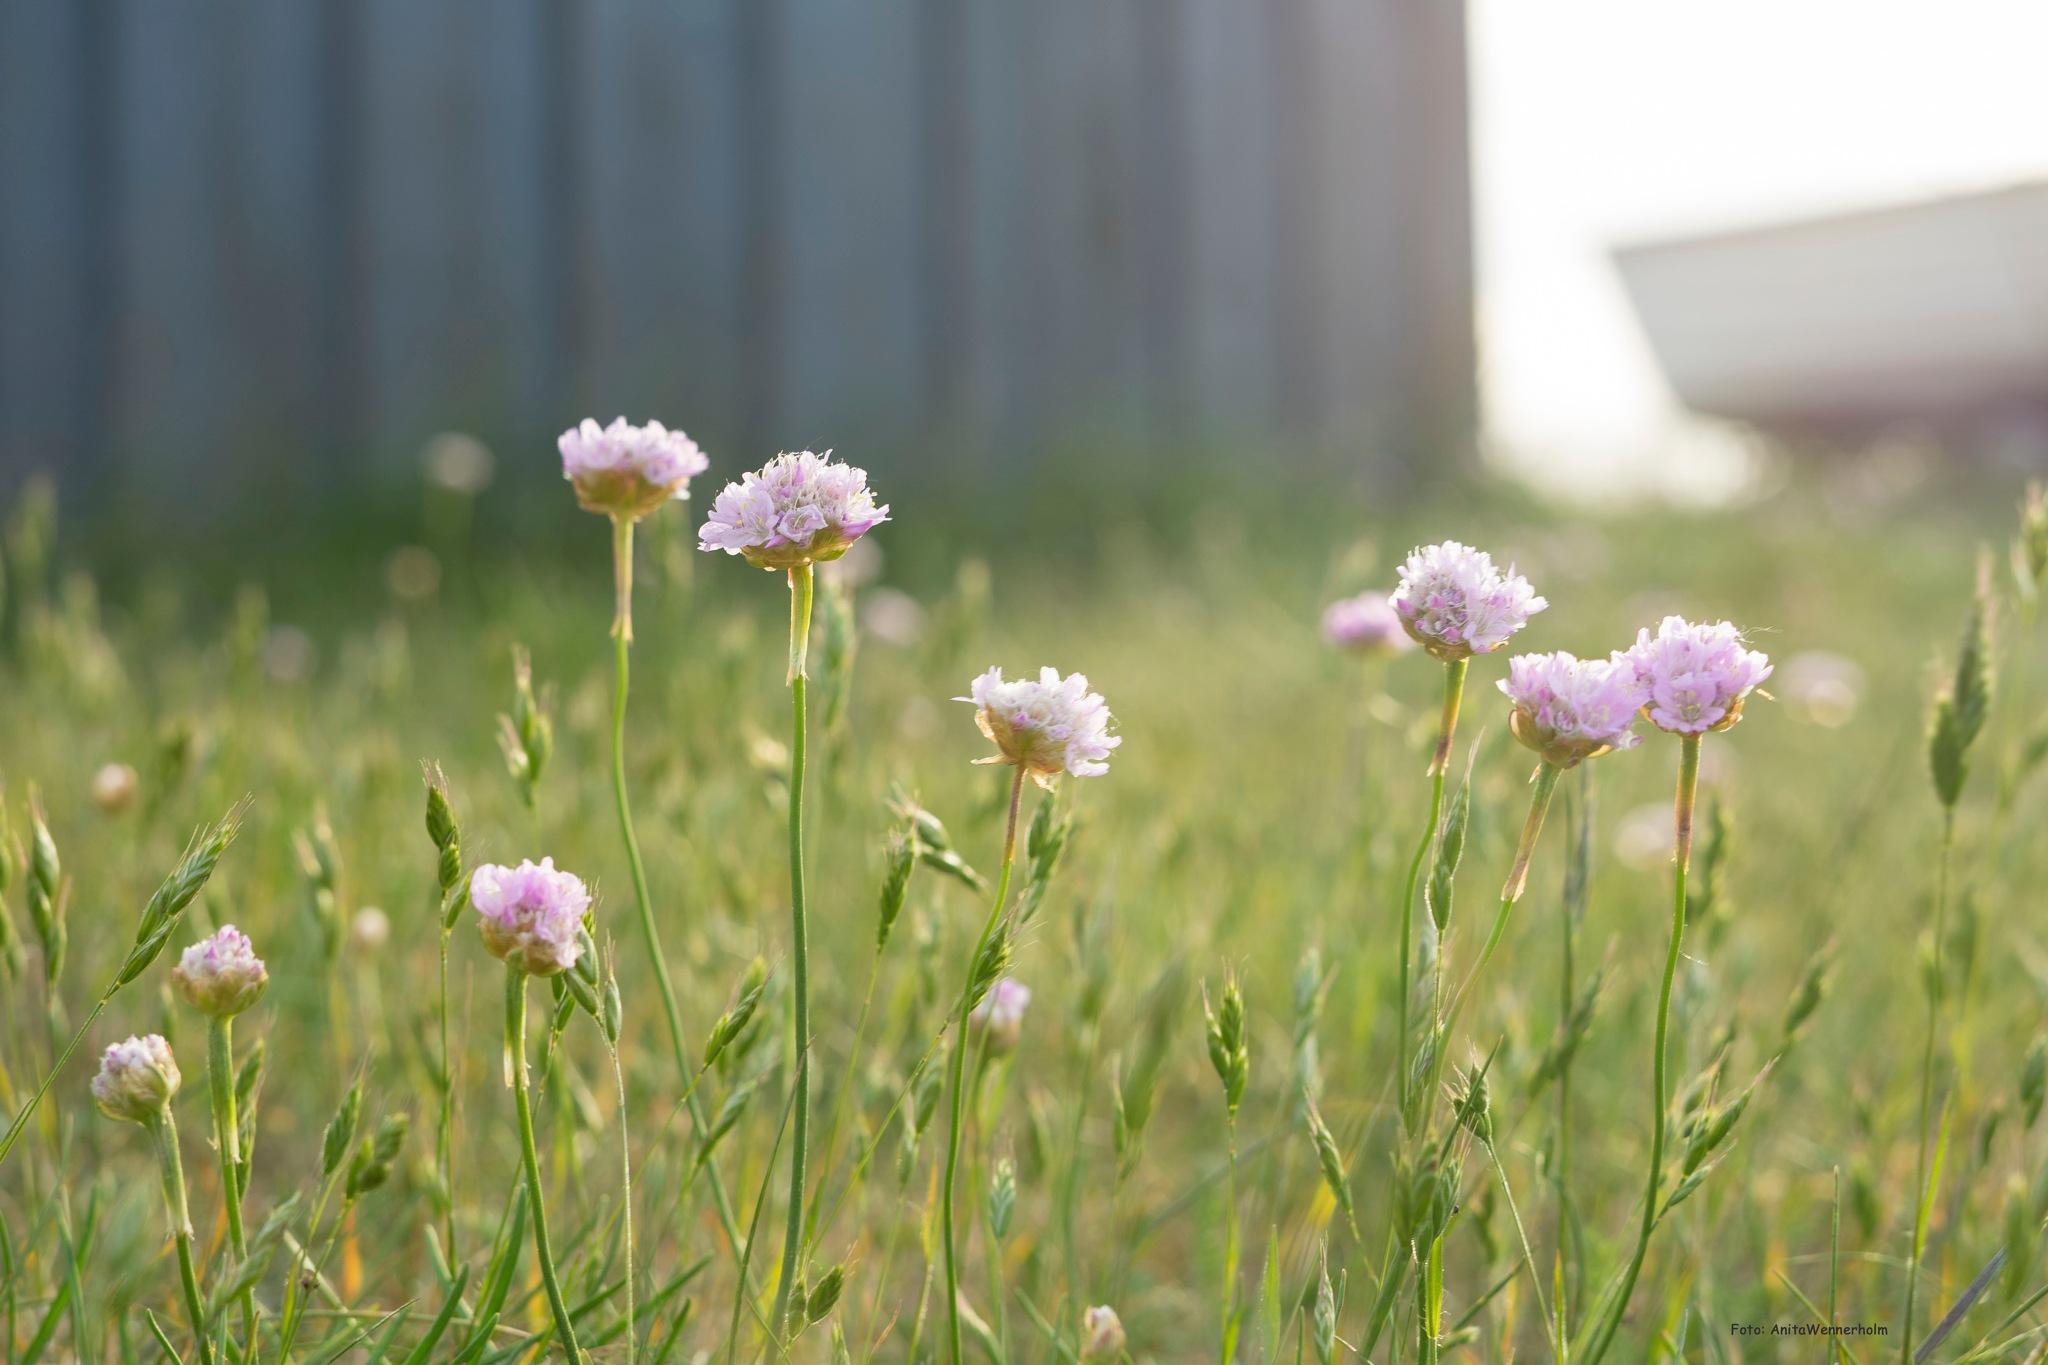 Summerflowers by AvieW